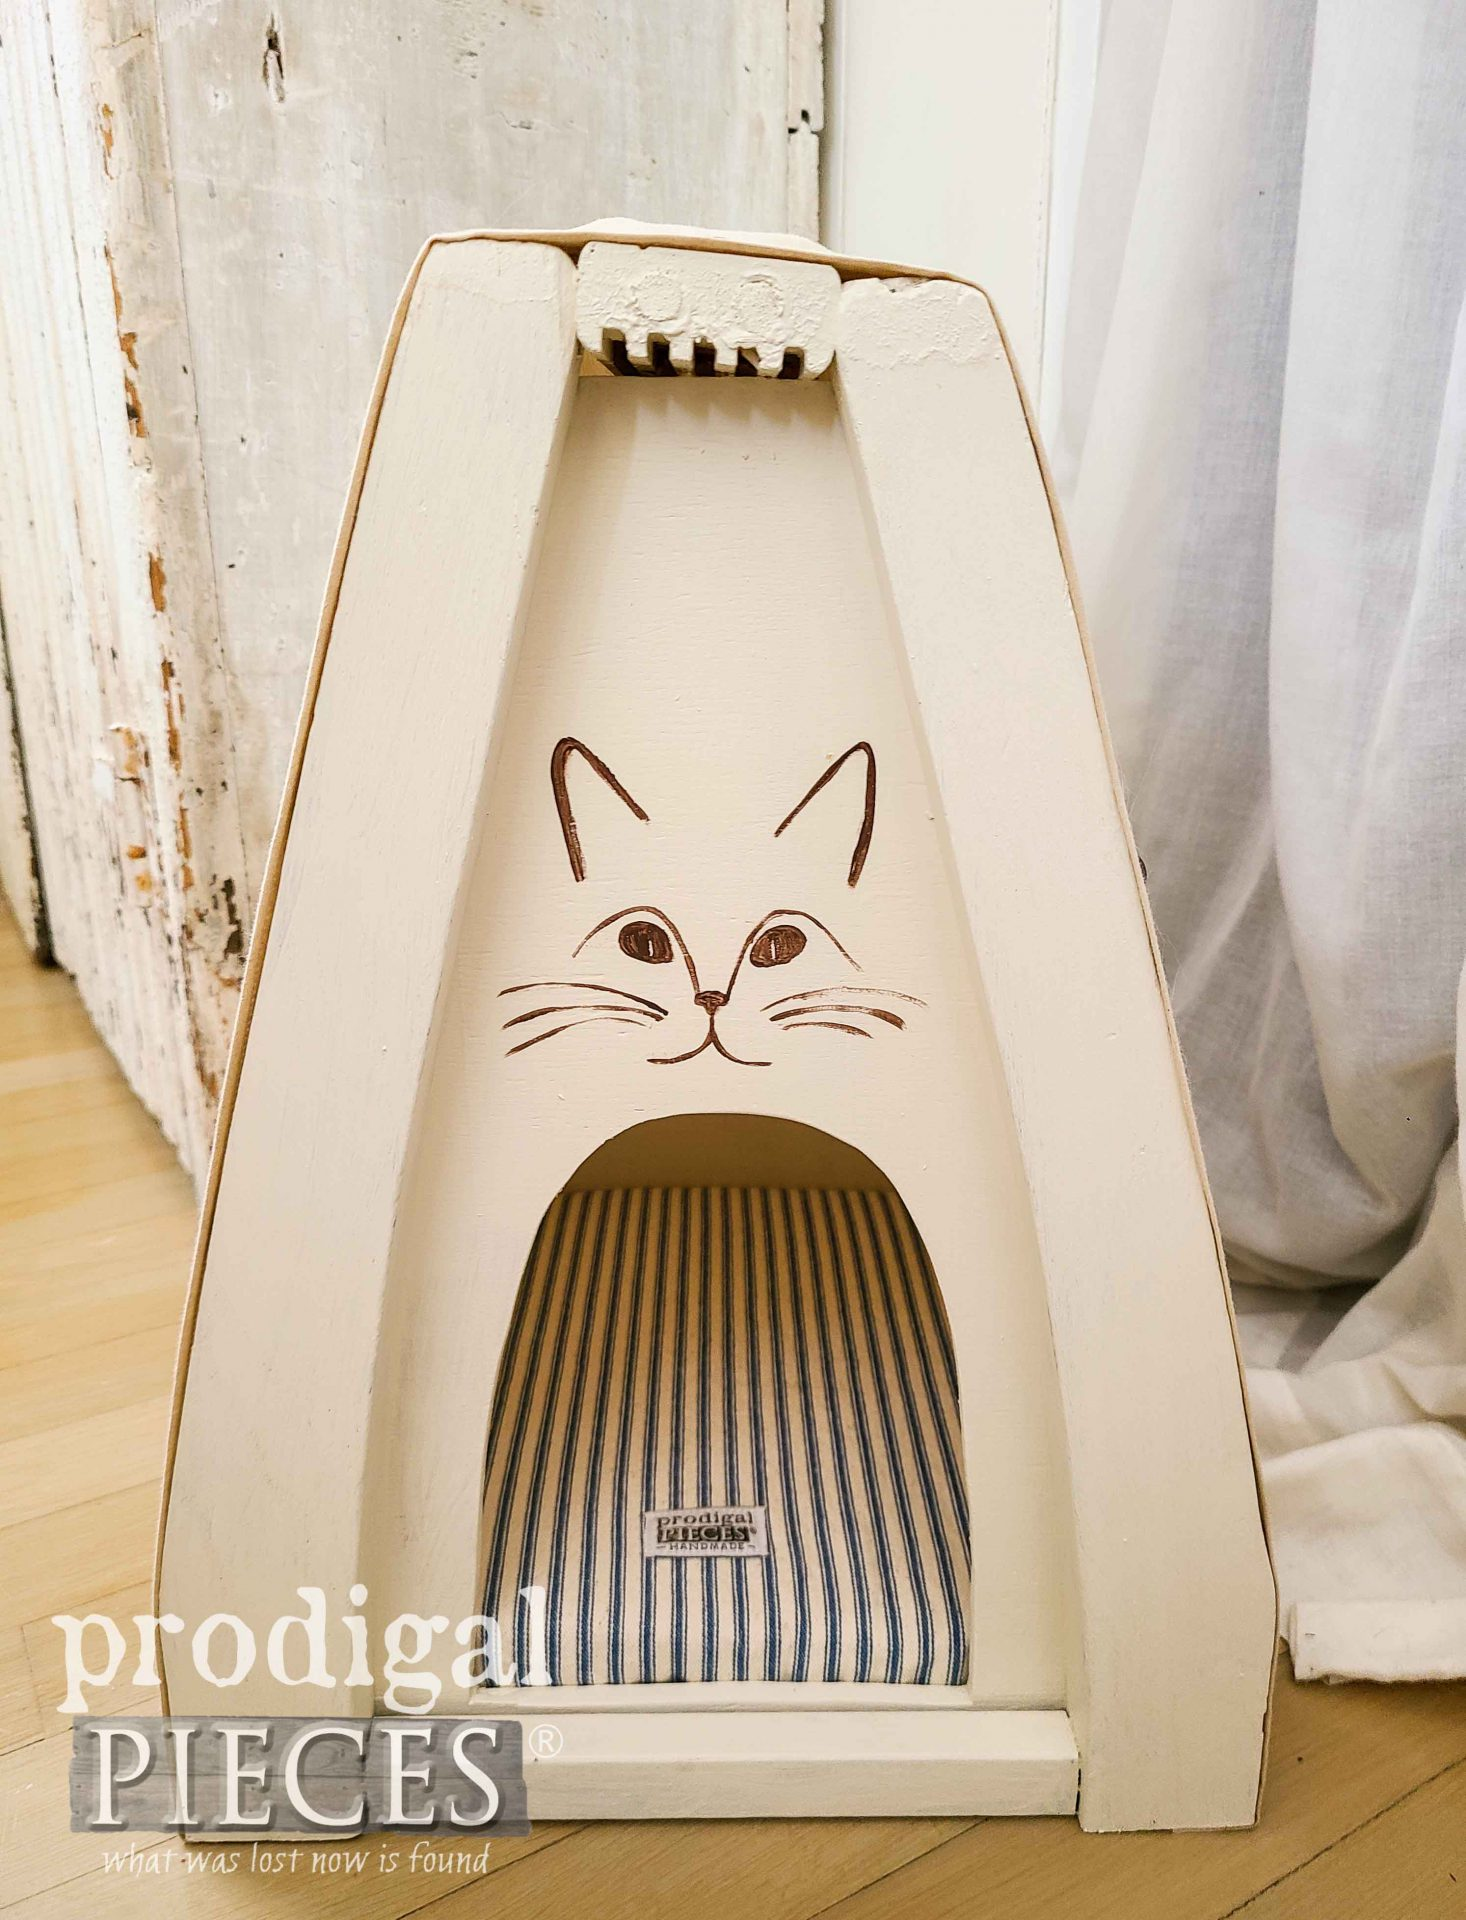 Farmhouse Ticking Stripe Cat Cave Bed by Larissa of Prodigal Pieces | prodigalpieces.com #prodigalpieces #diy #cats #pets #handmade